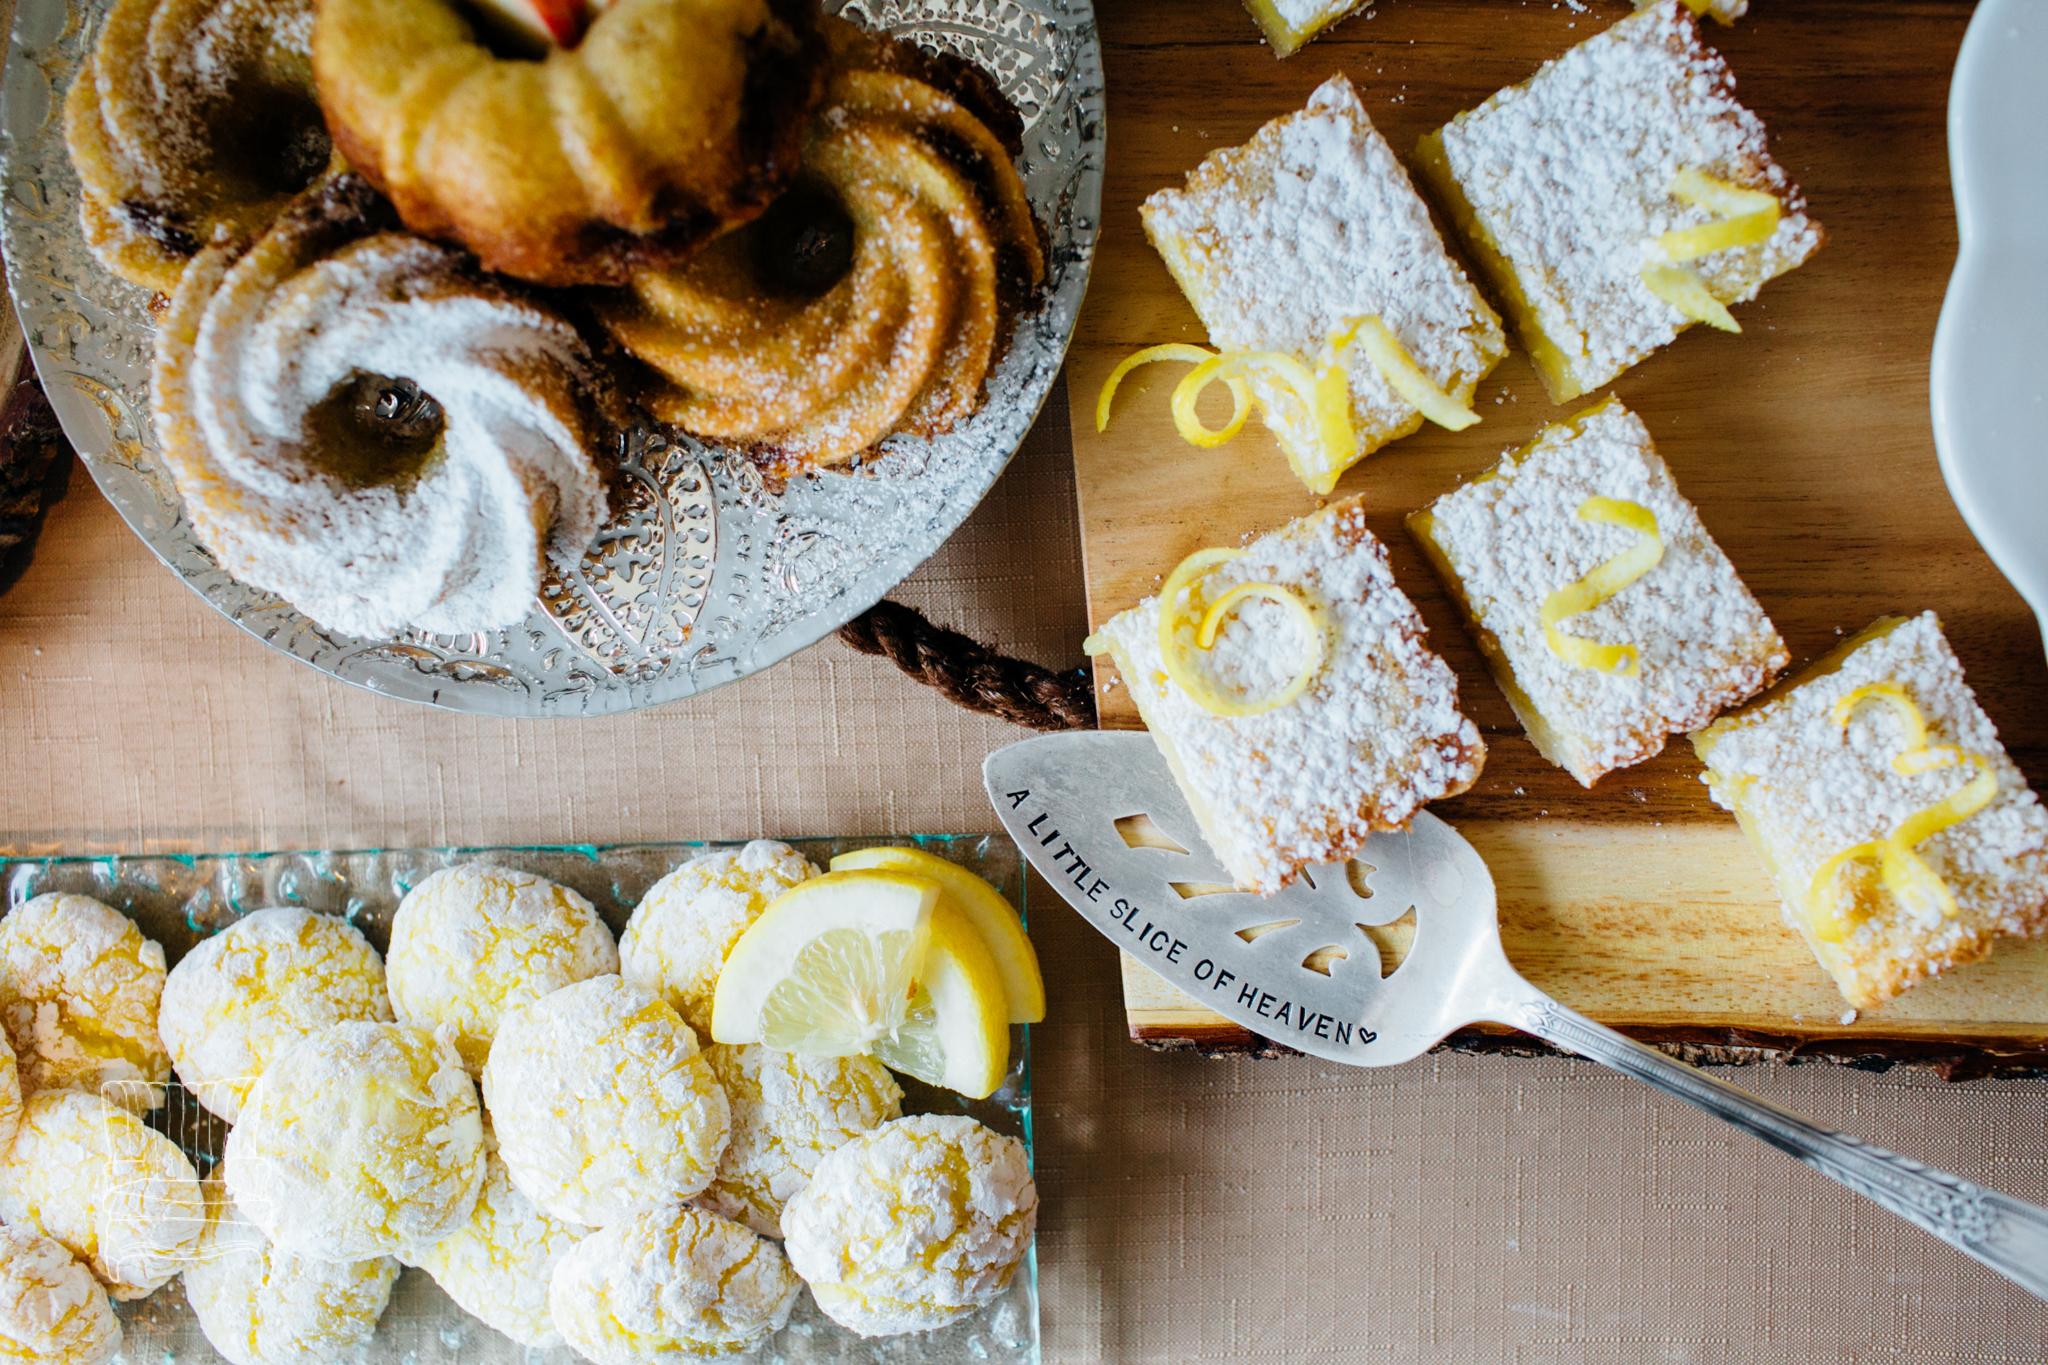 bellingham-seattle-marketing-food-photographer-dessert-slice-of-heaven-4.jpg